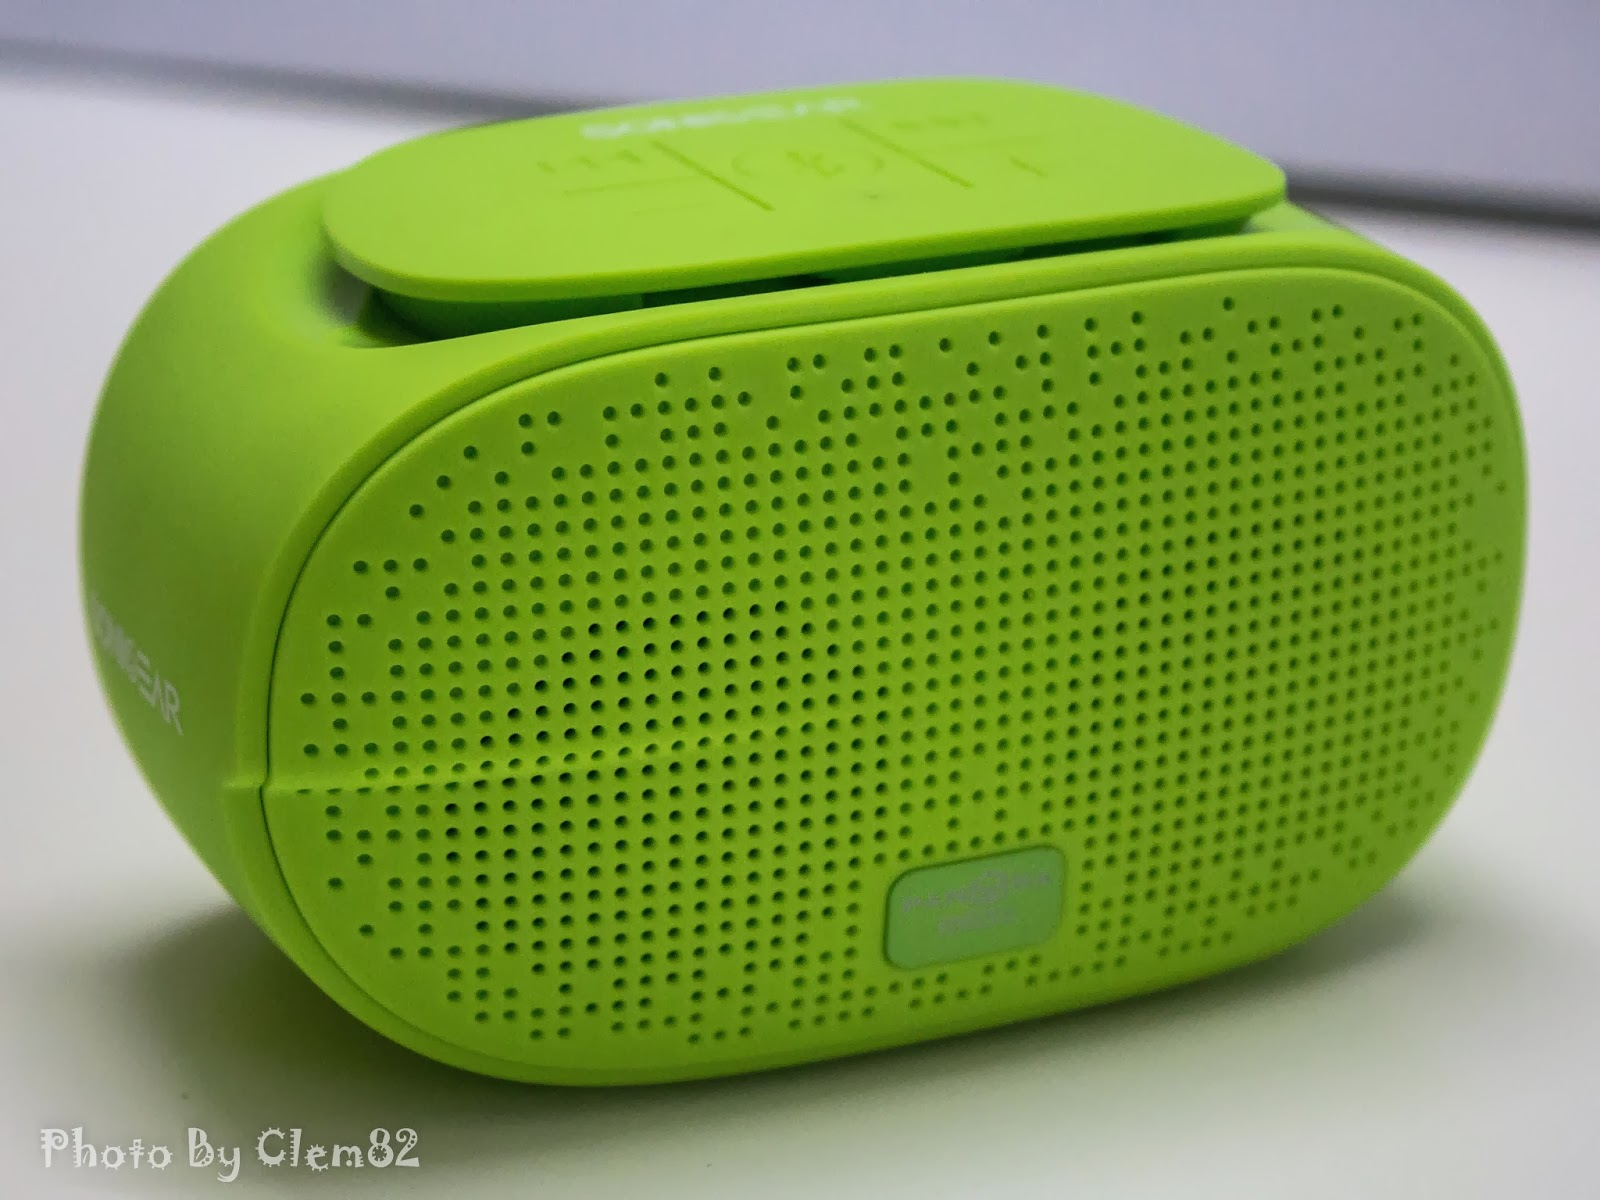 Opening Pandora's Box: SonicGear Pandora Wireless Bluetooth Media Player Series 6